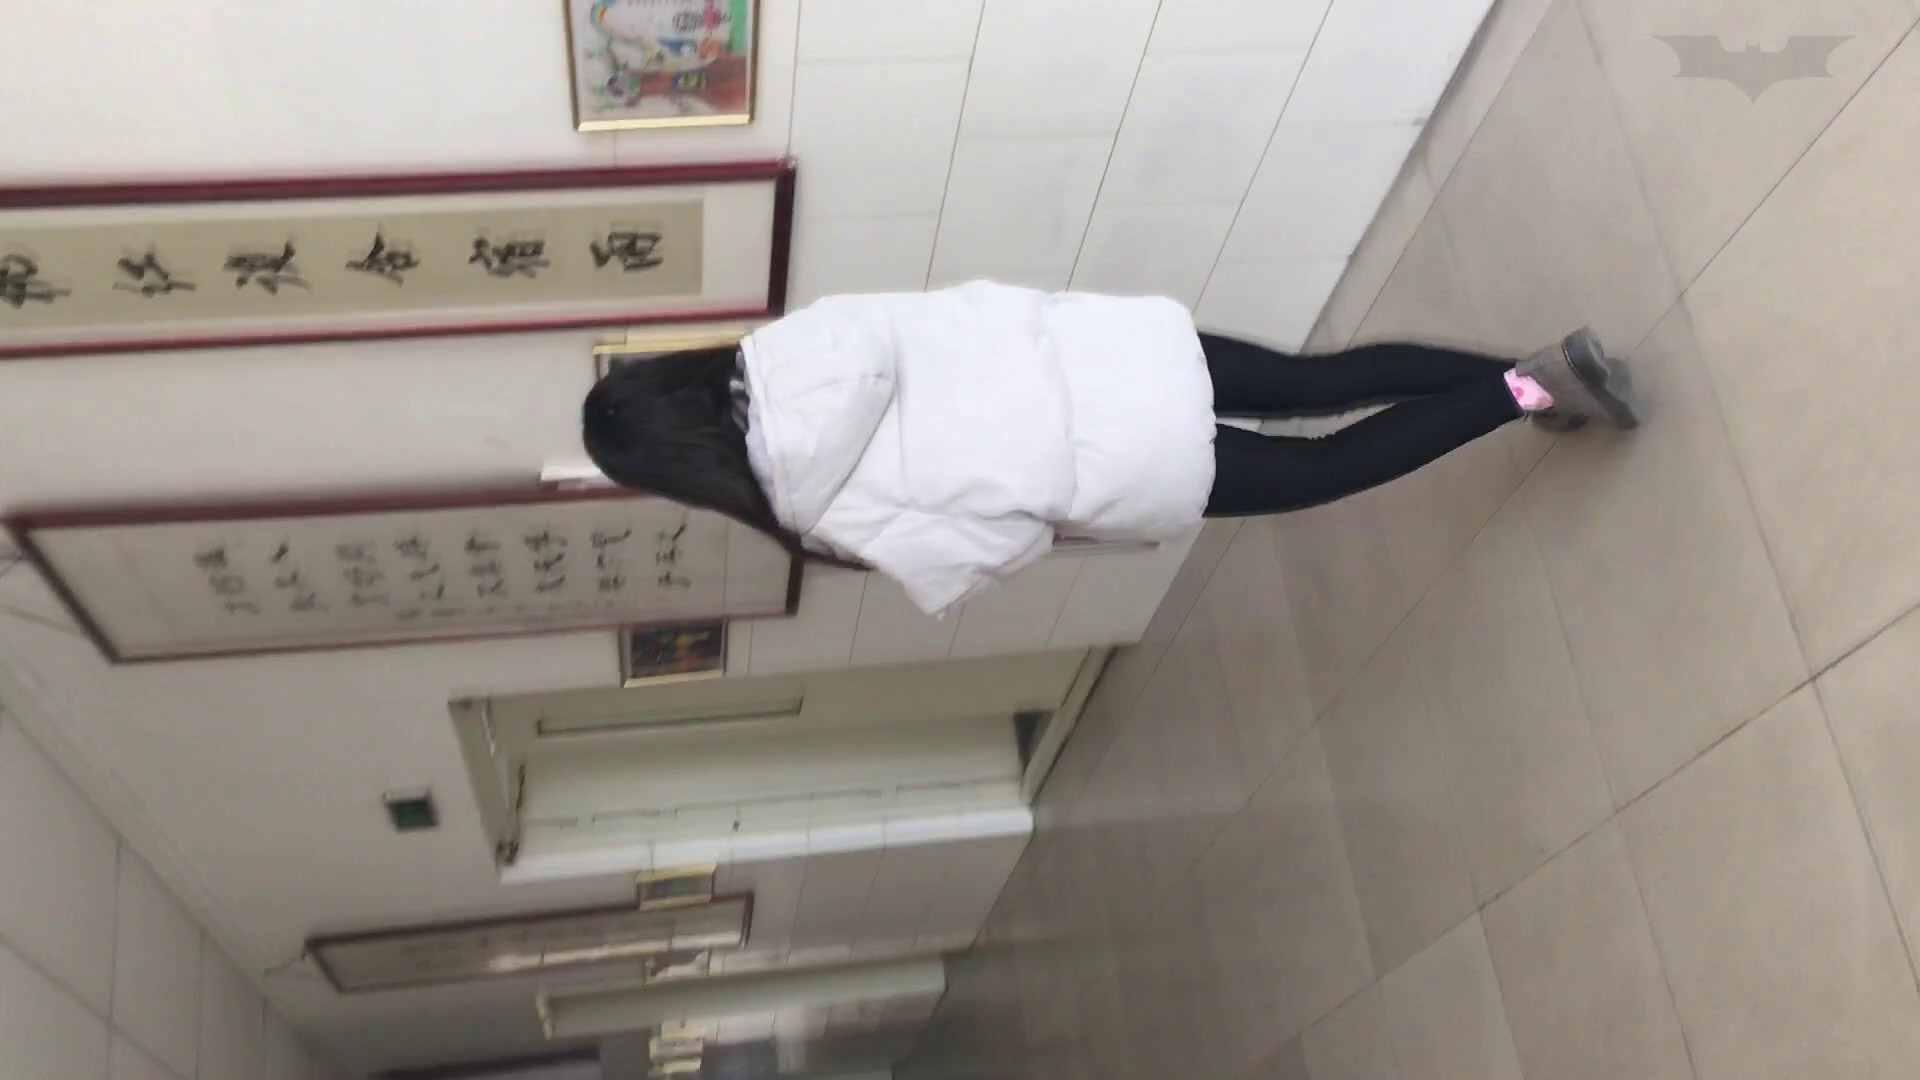 芸術大学ガチ潜入盗撮 JD盗撮 美女の洗面所の秘密 Vol.80 盛合せ  79PIX 22